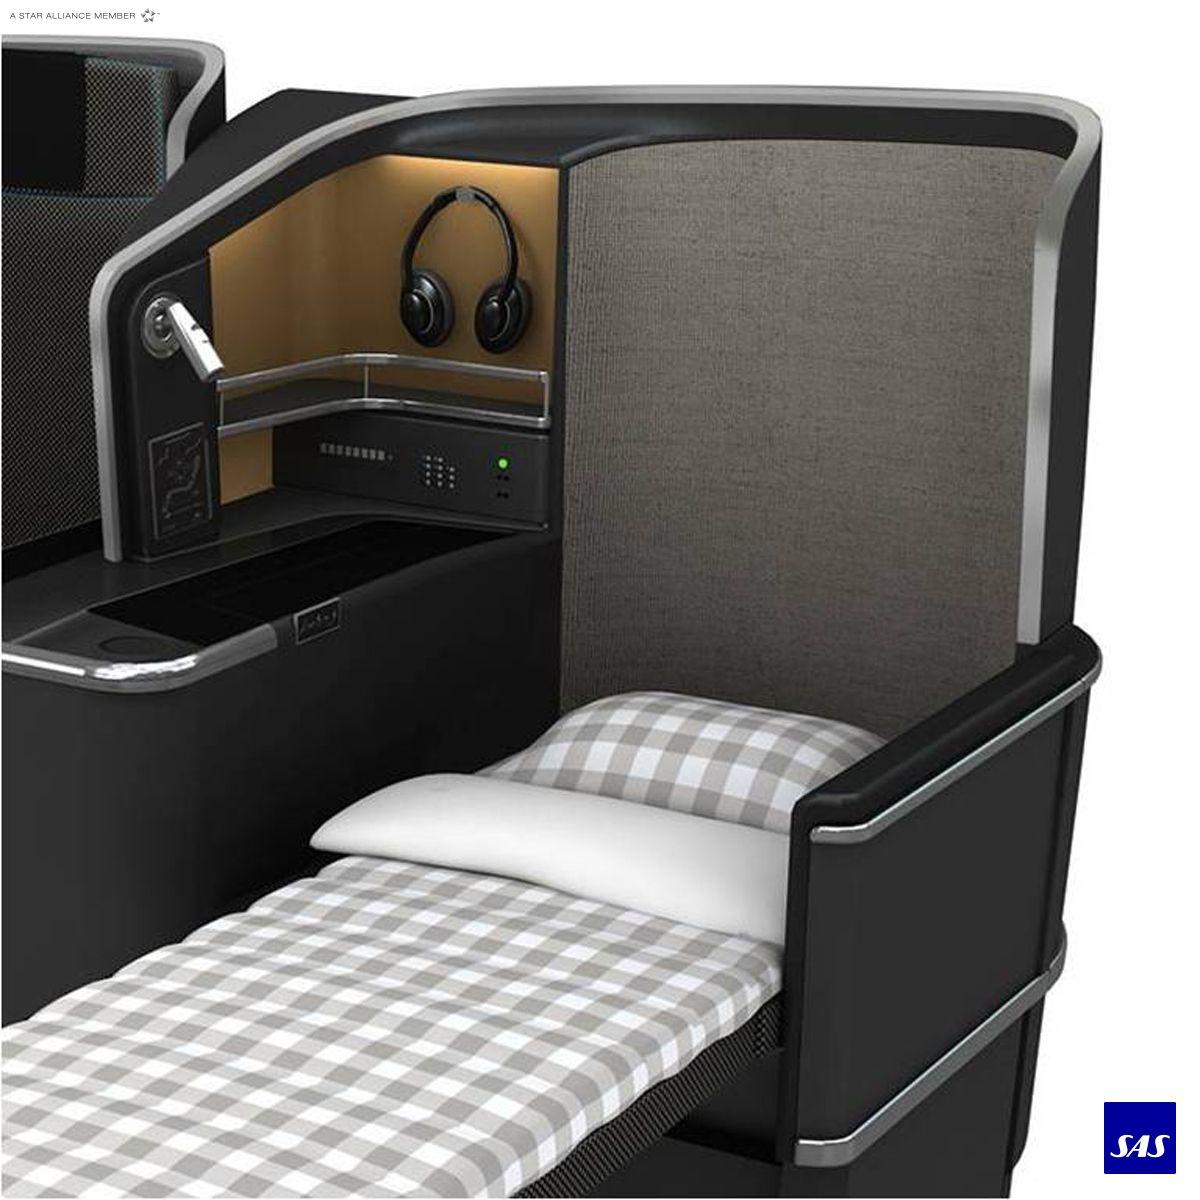 Sas Business Fully Flat Bed Bedding From Hastens Luftfahrt Kommerziell